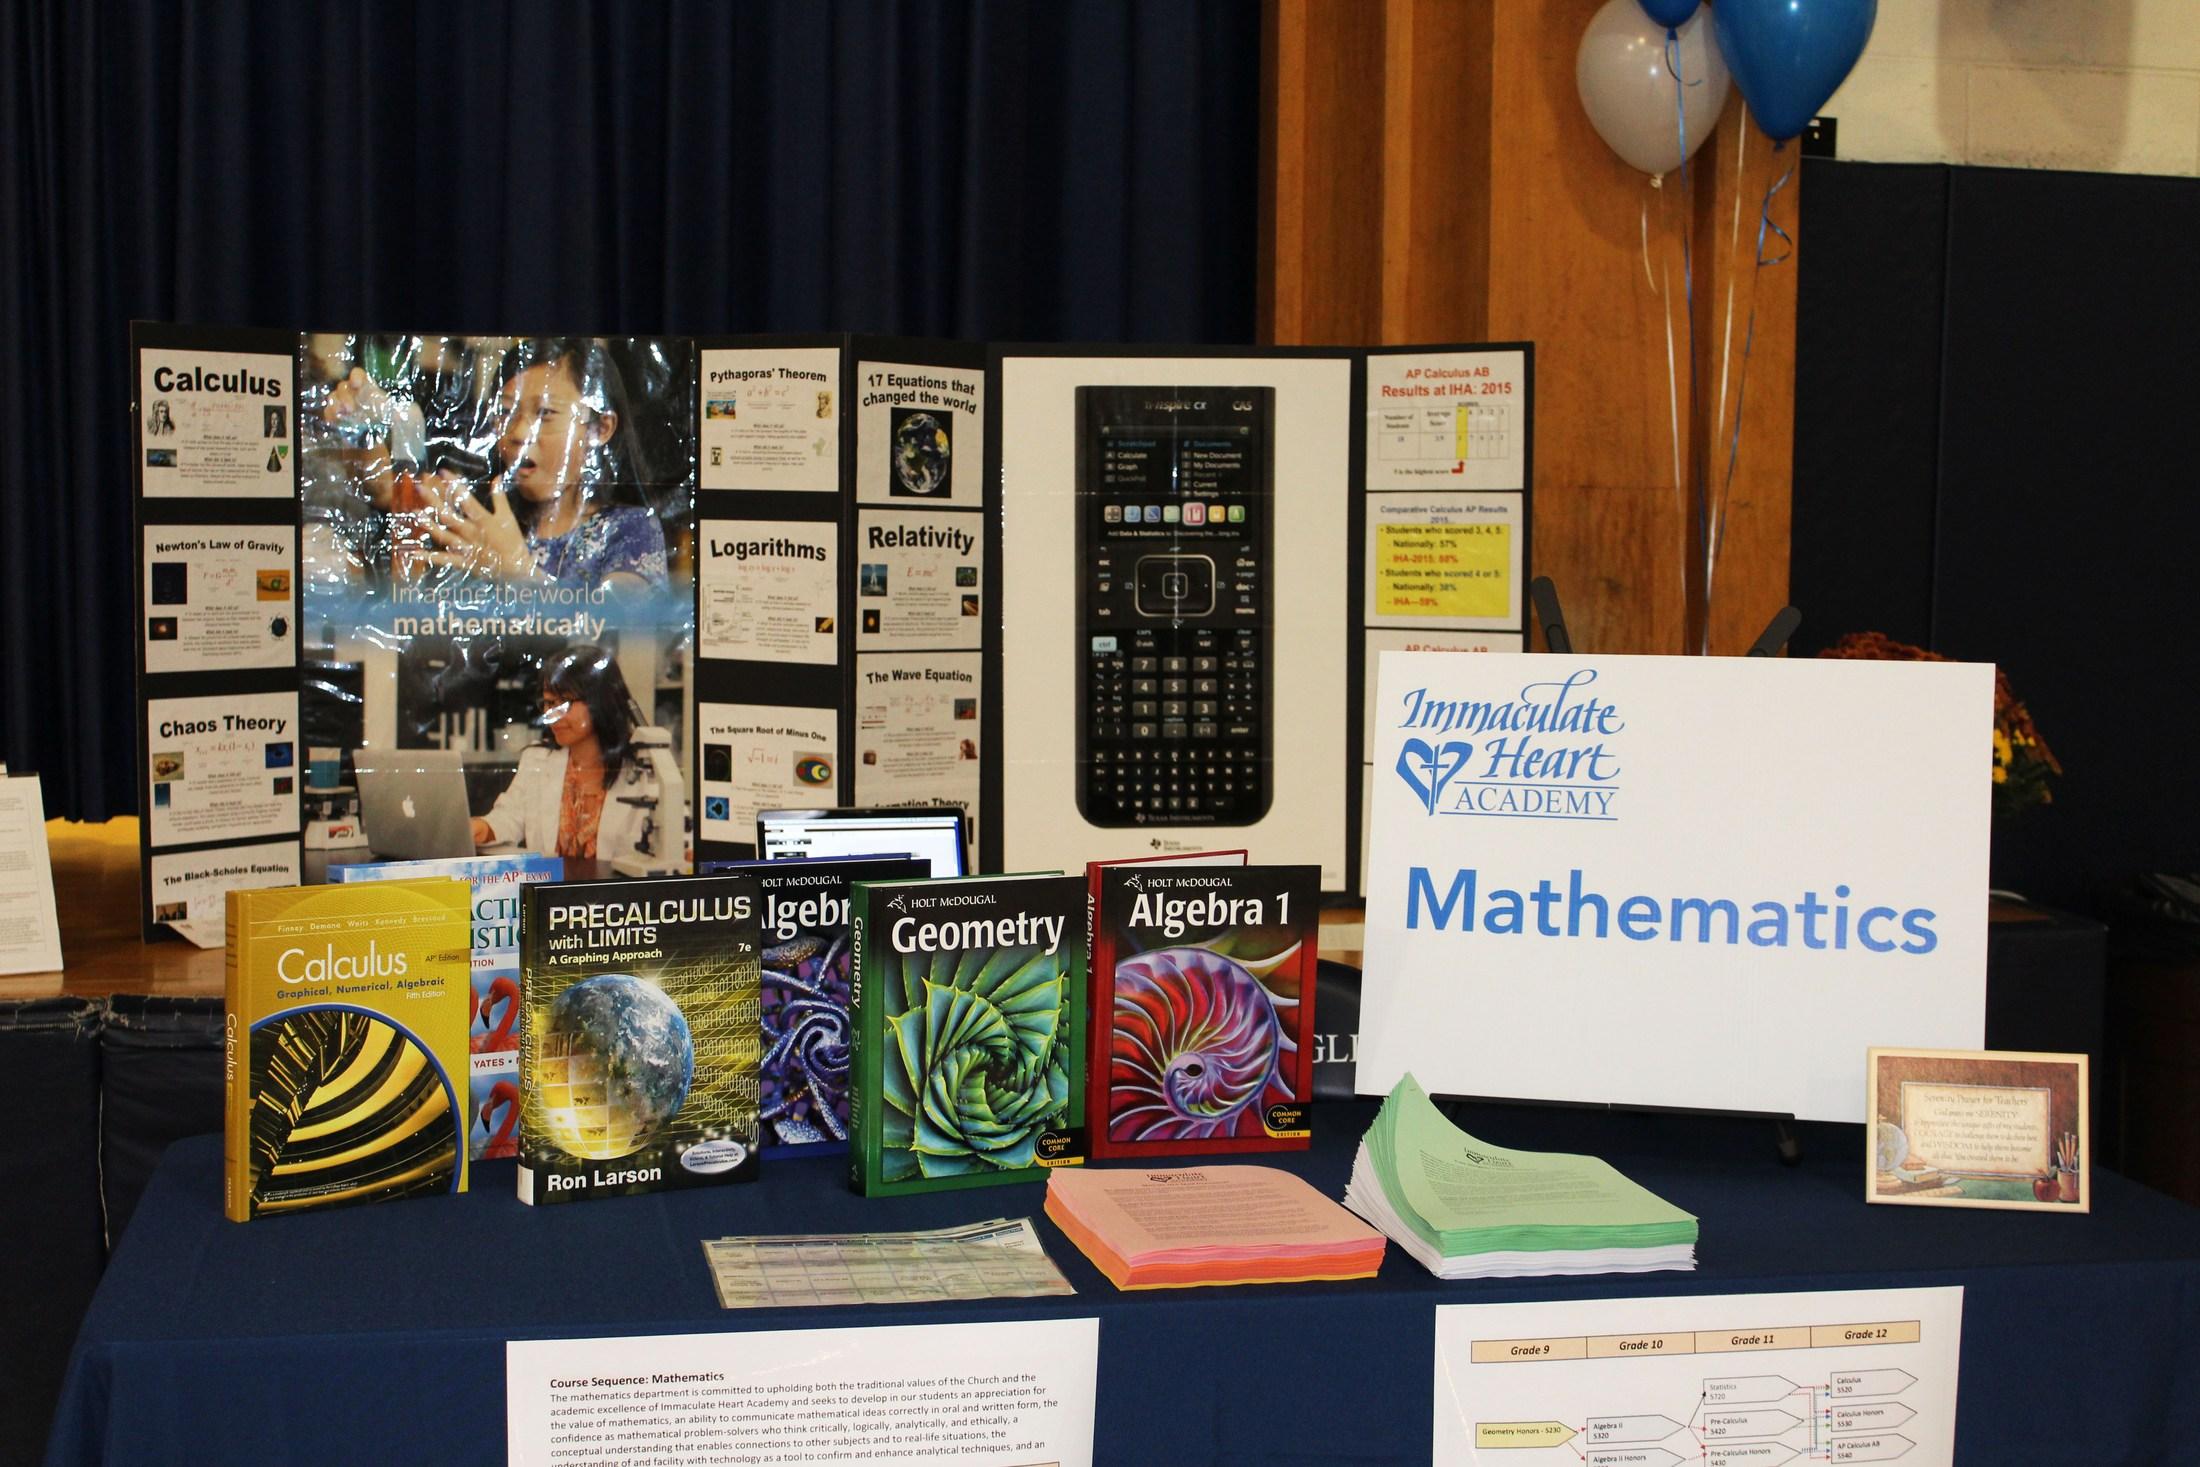 Mathematics - Miscellaneous - Immaculate Heart Academy